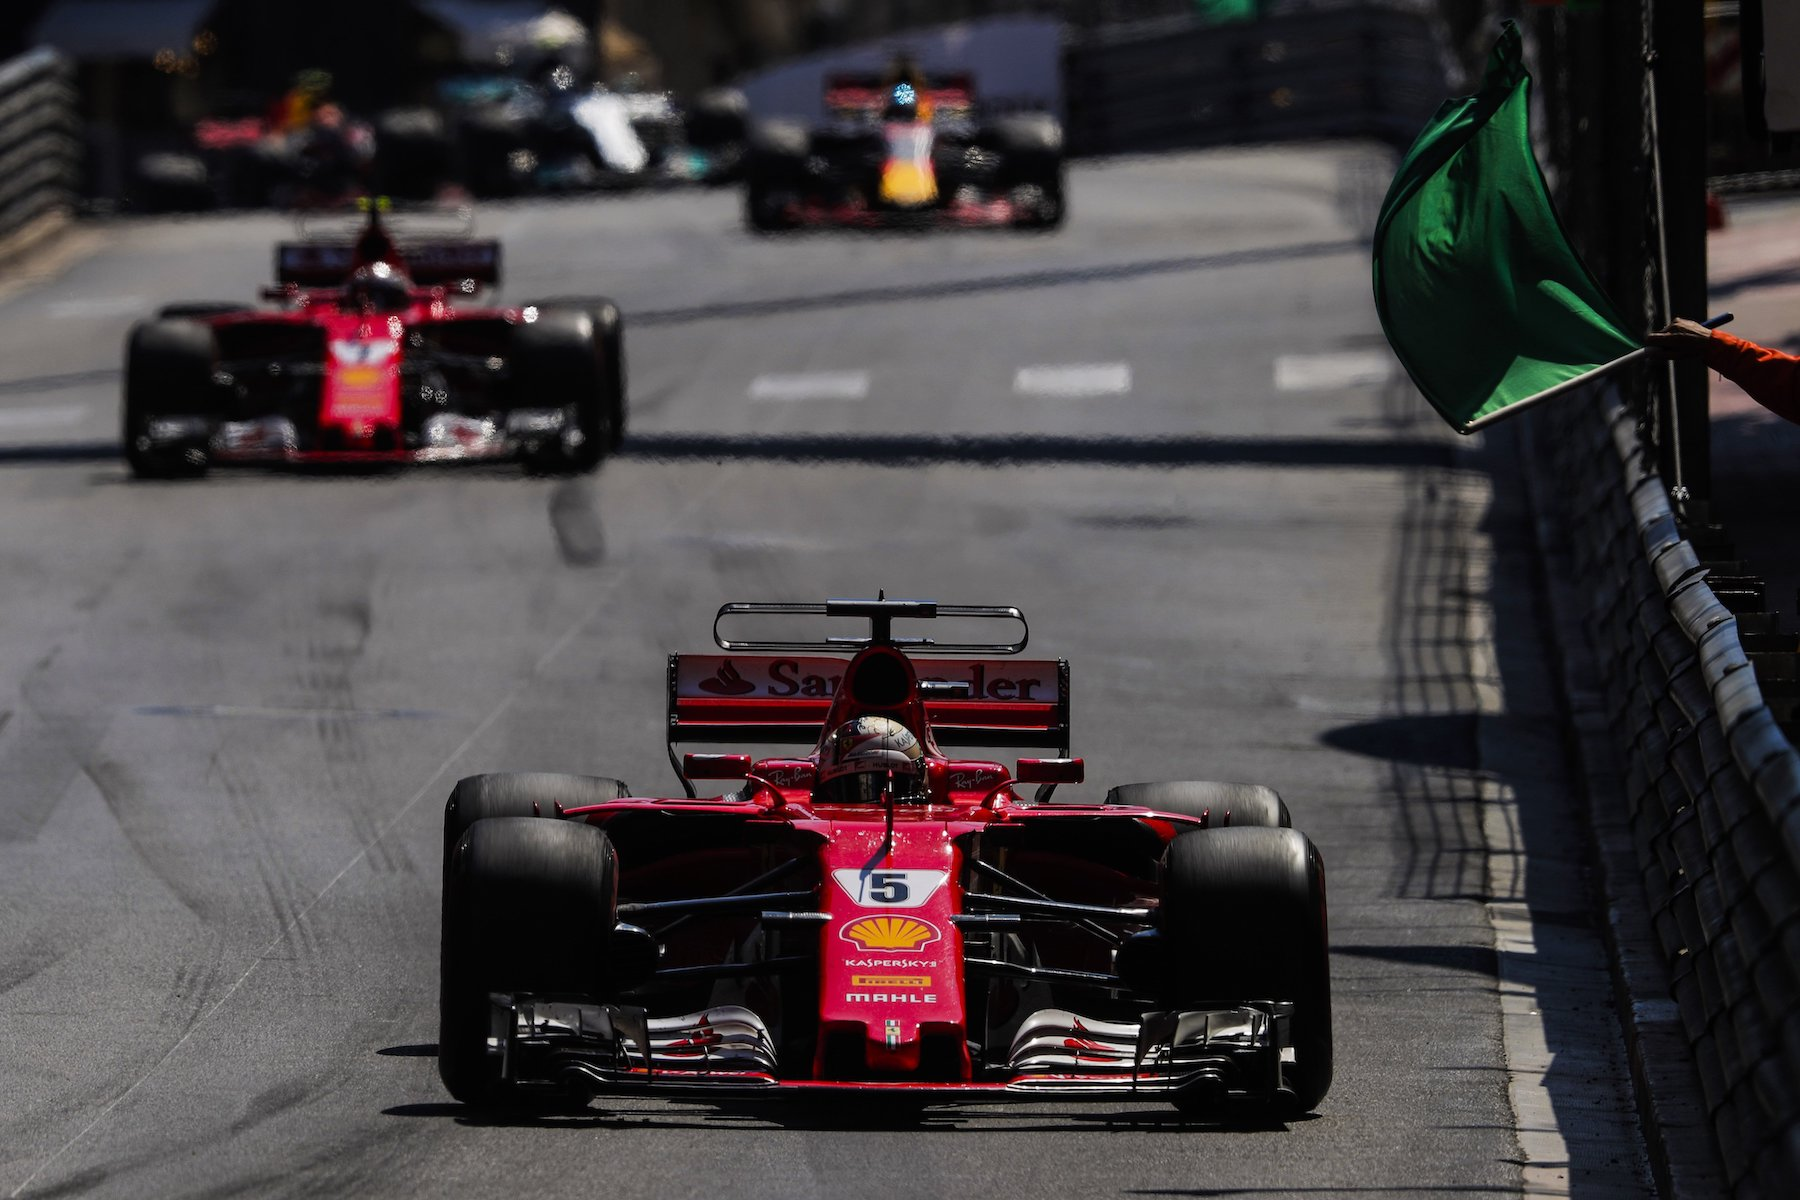 N 2017 Sebastian Vettel | Ferrari SF70H | 2017 Monaco GP winner 3 copy.jpg